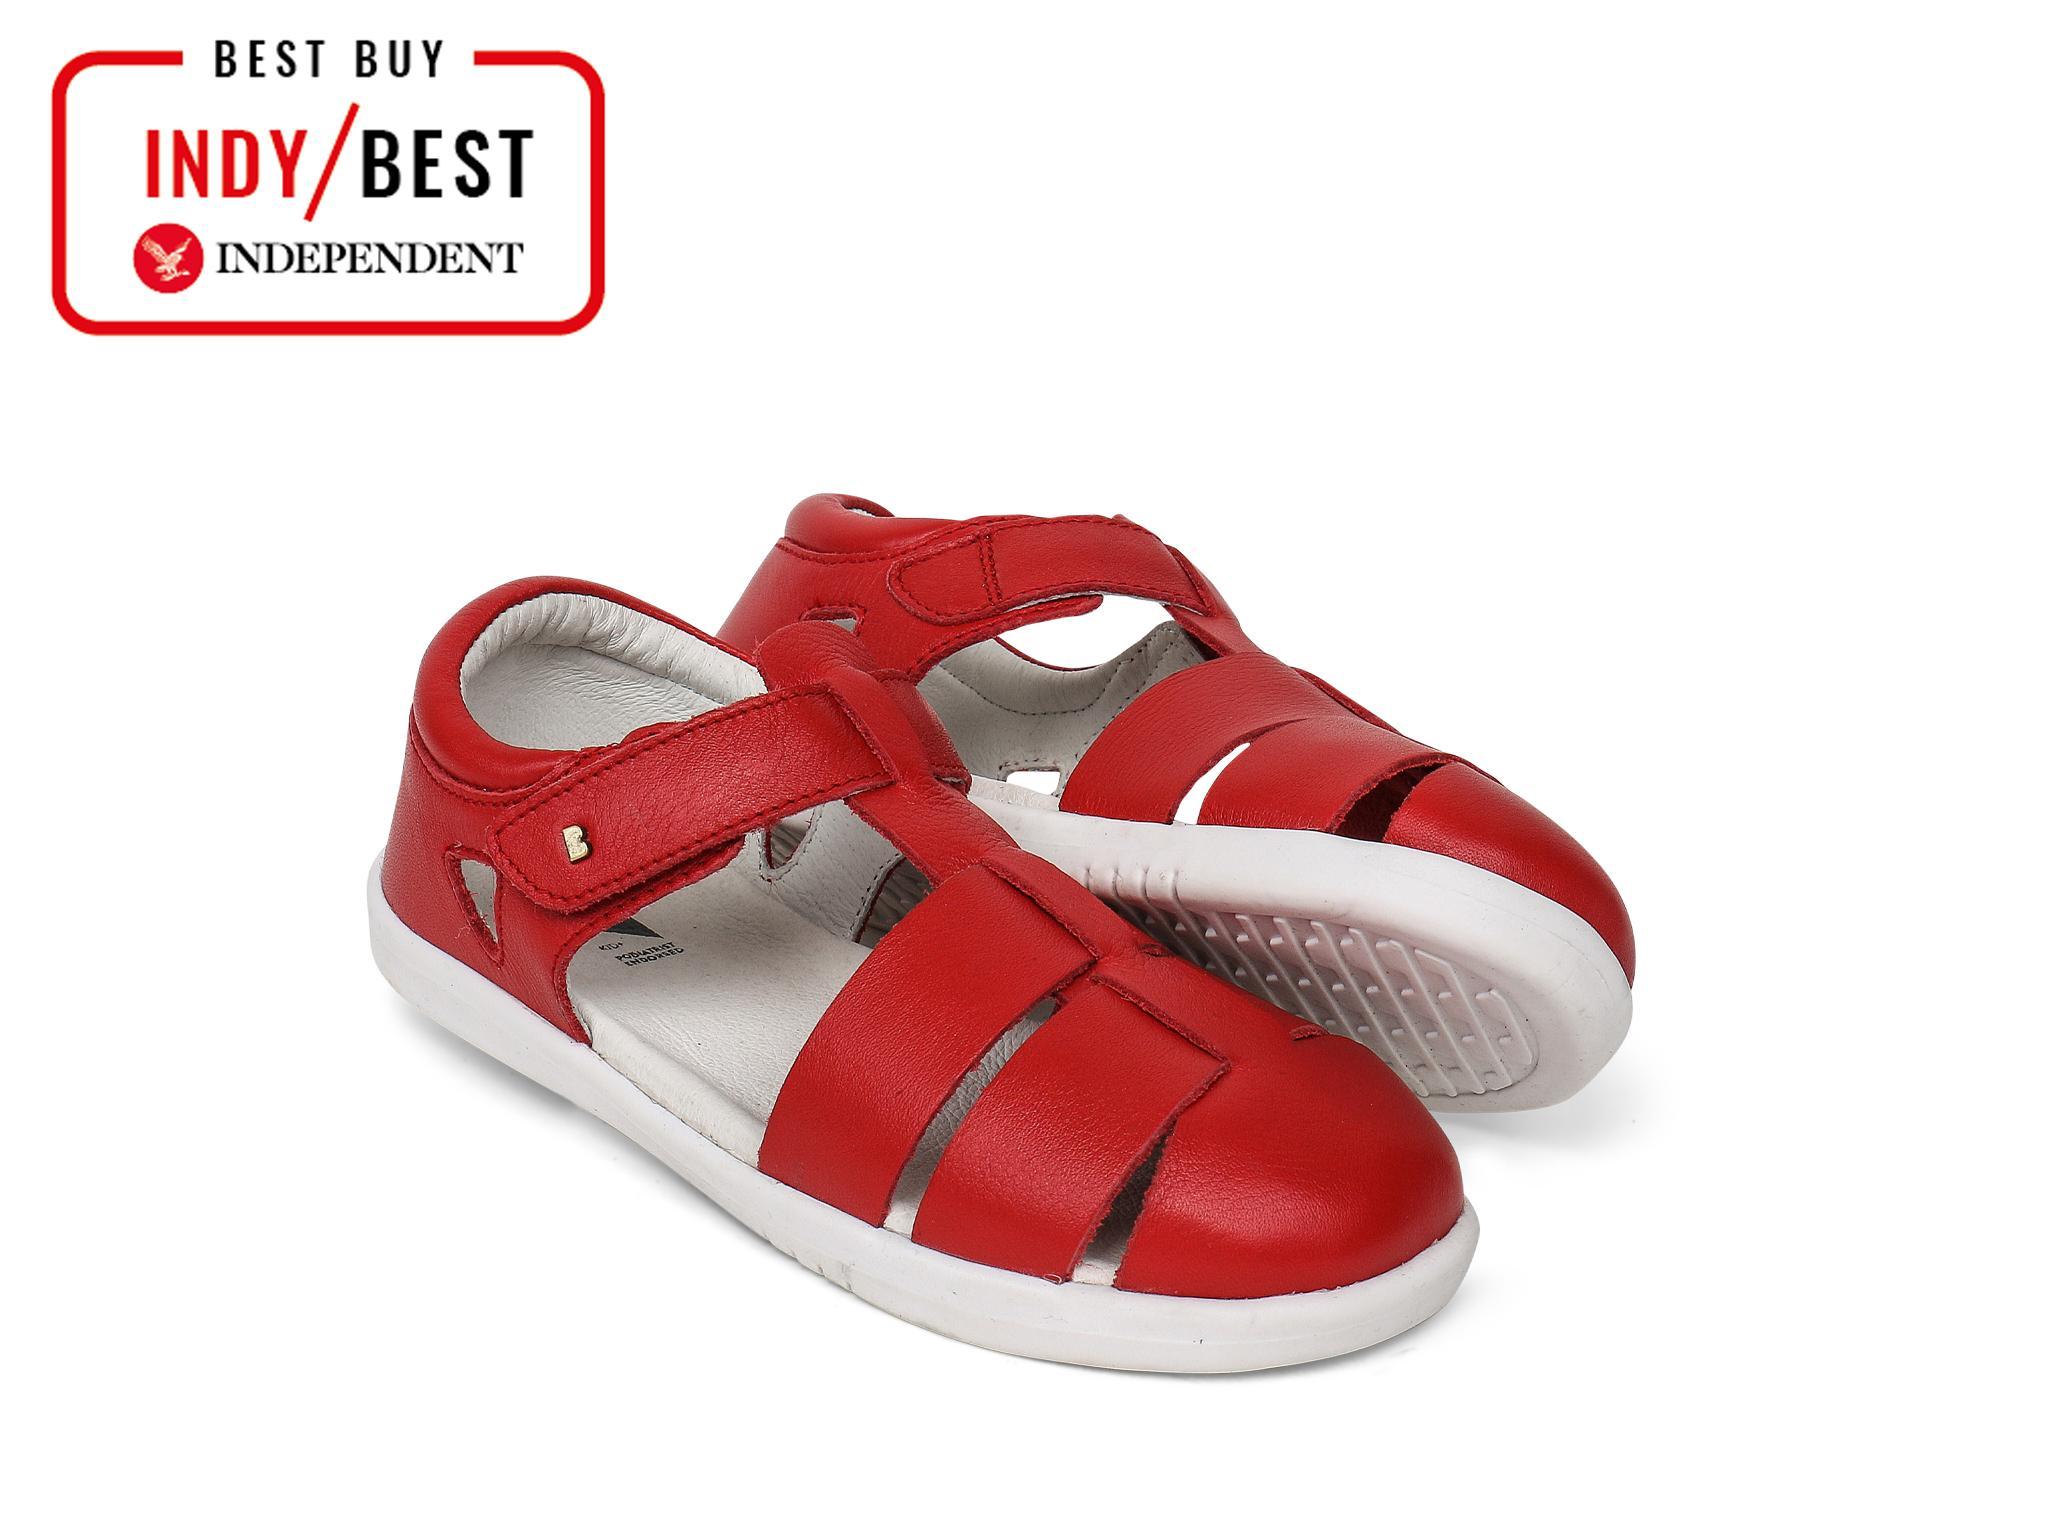 Best kids' sandals 2020: From flip